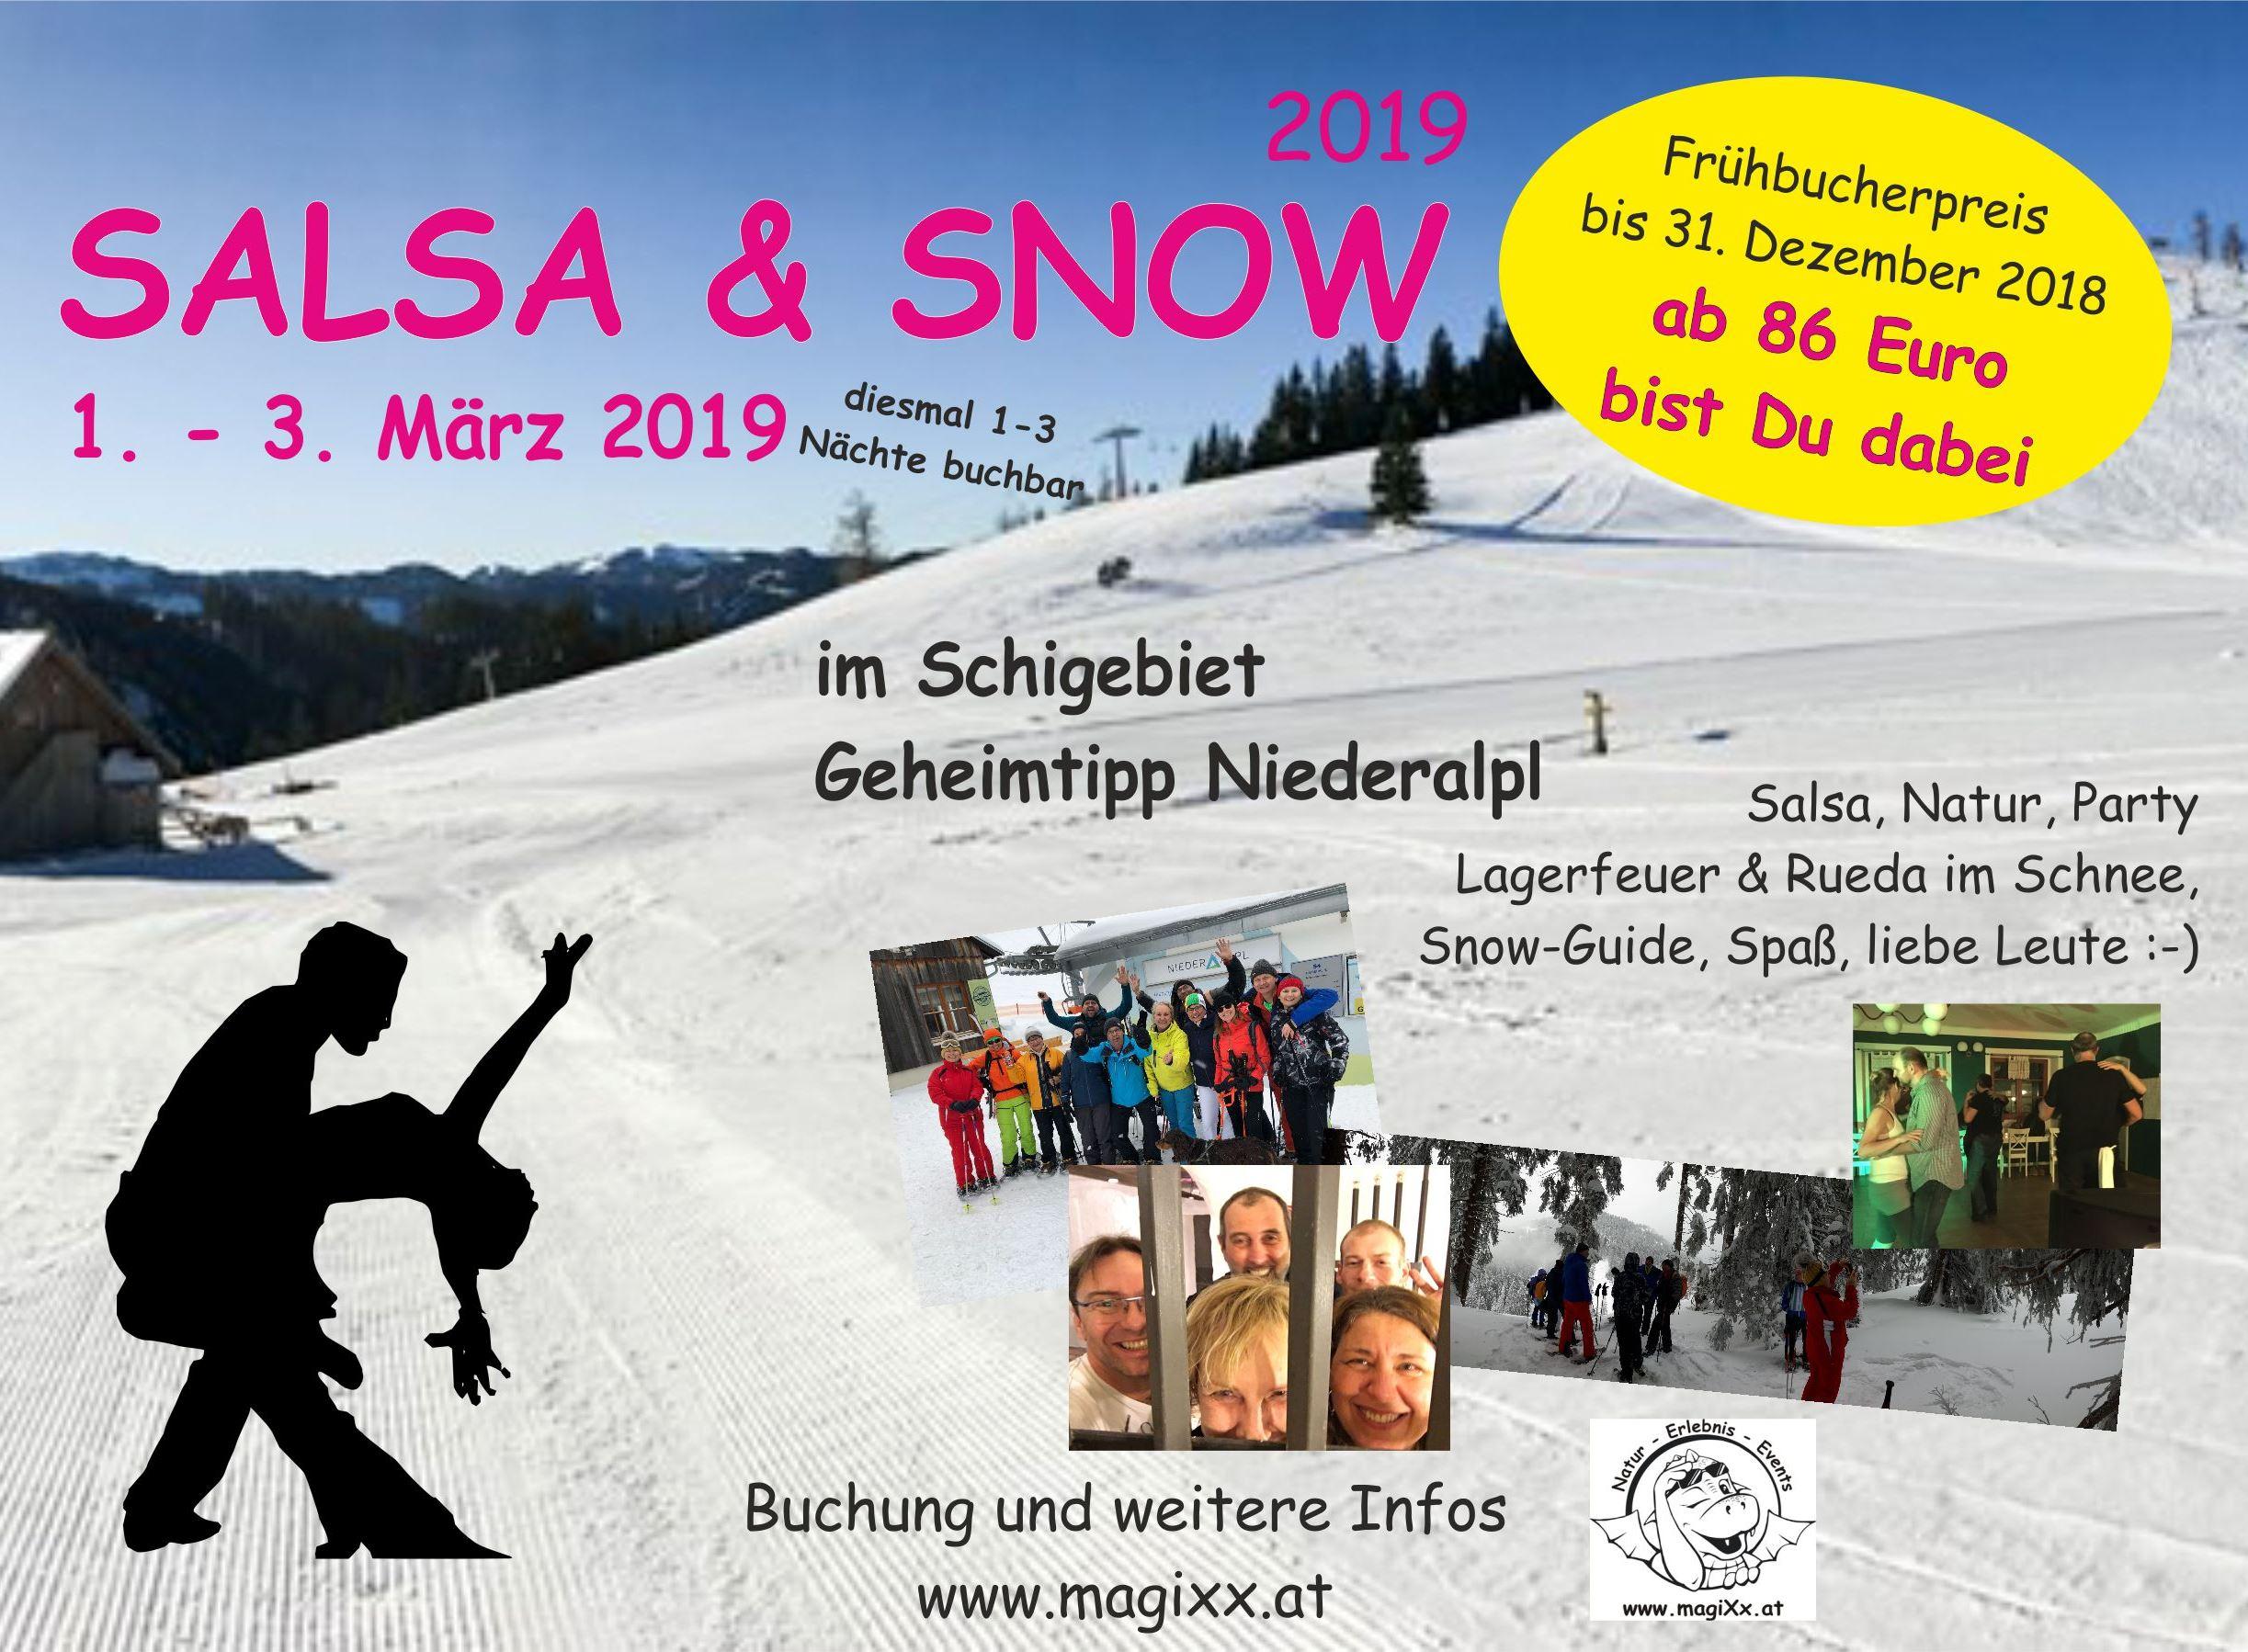 Salsa & Snow